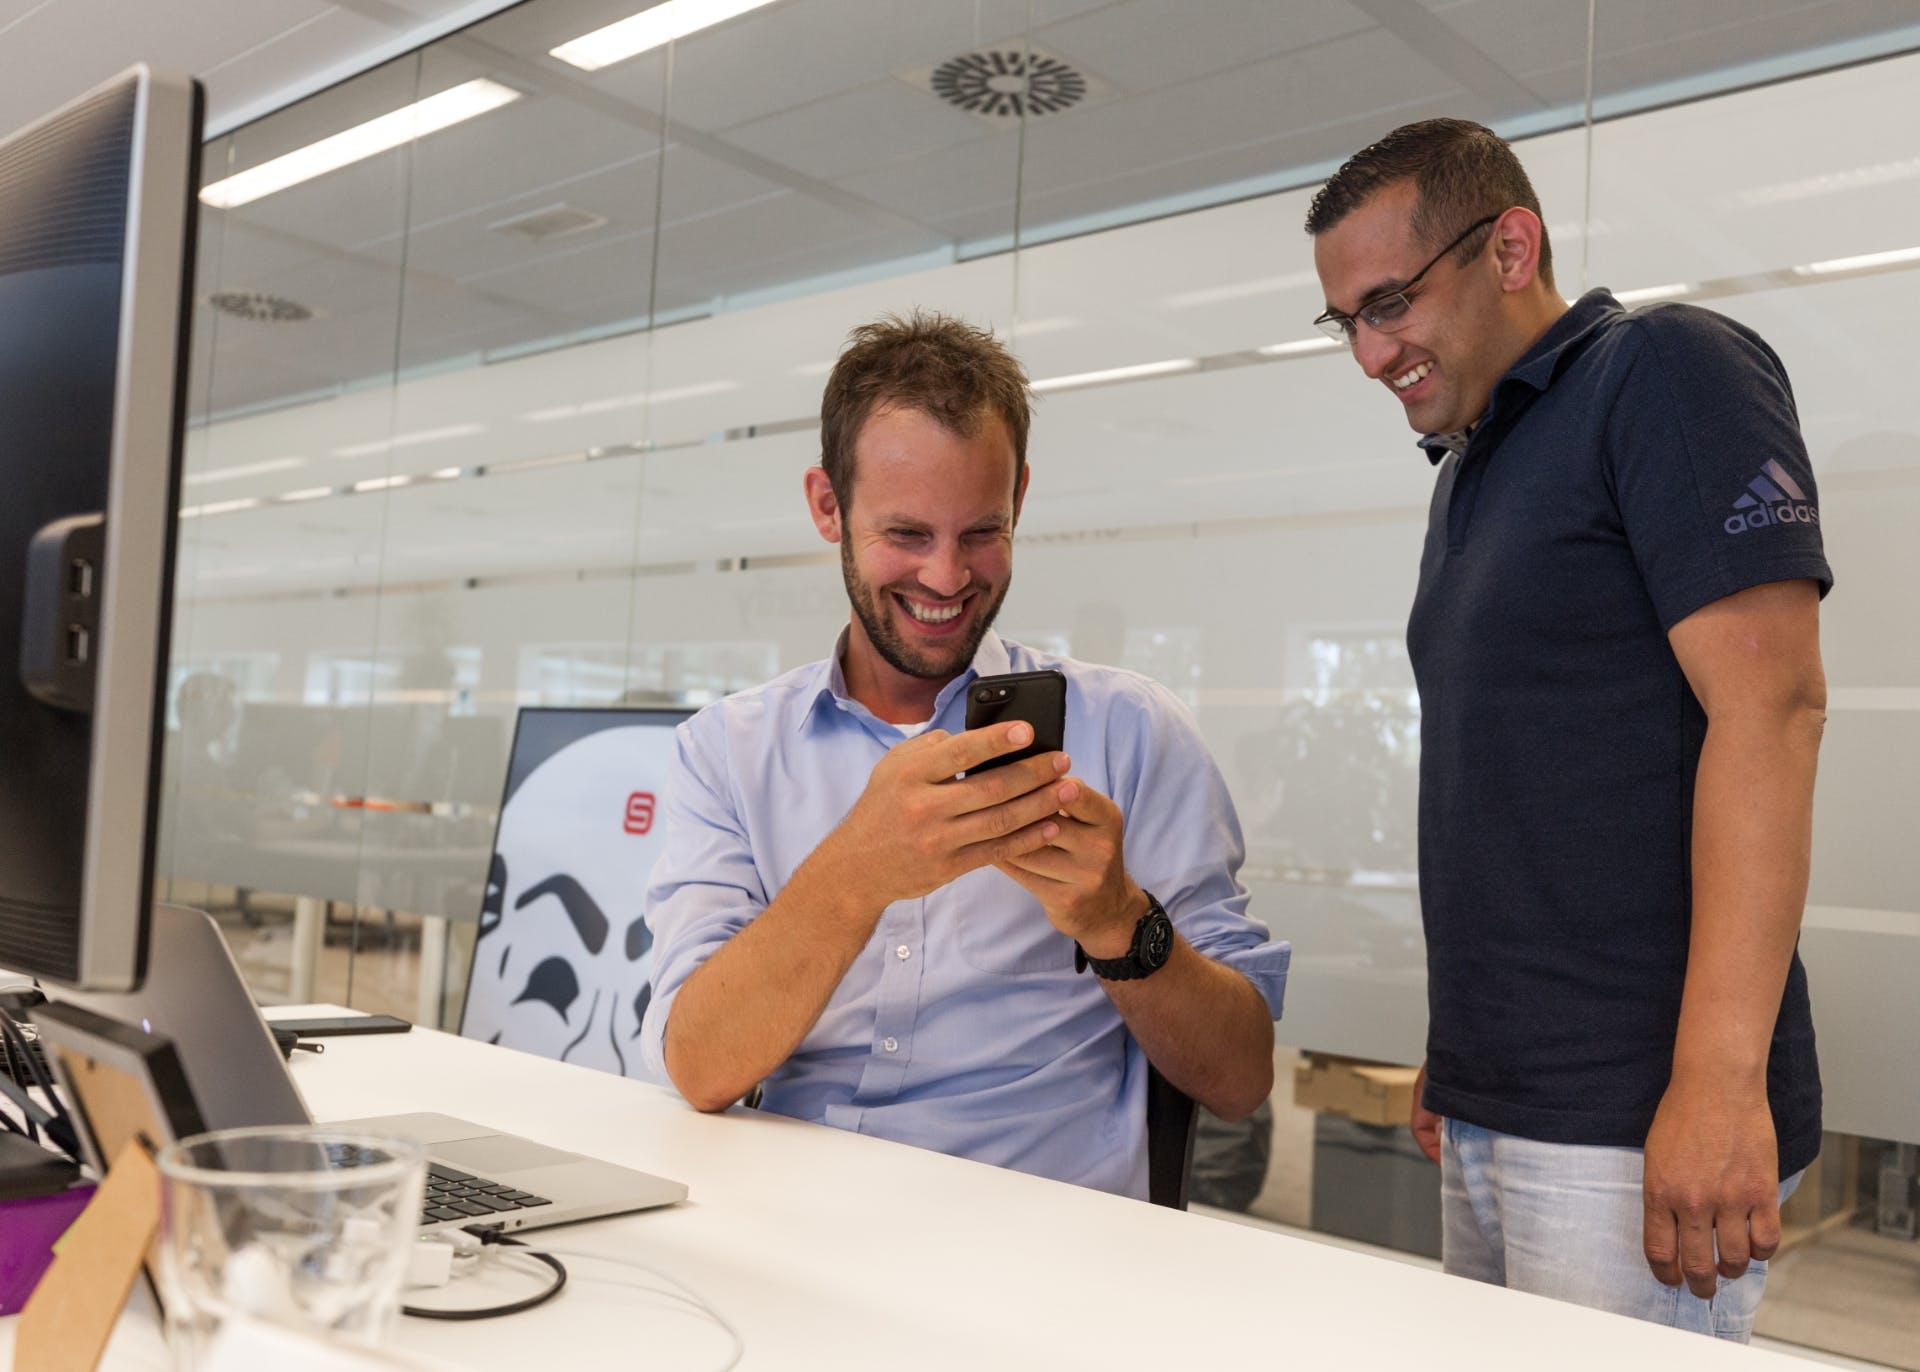 Two men laughing at phone